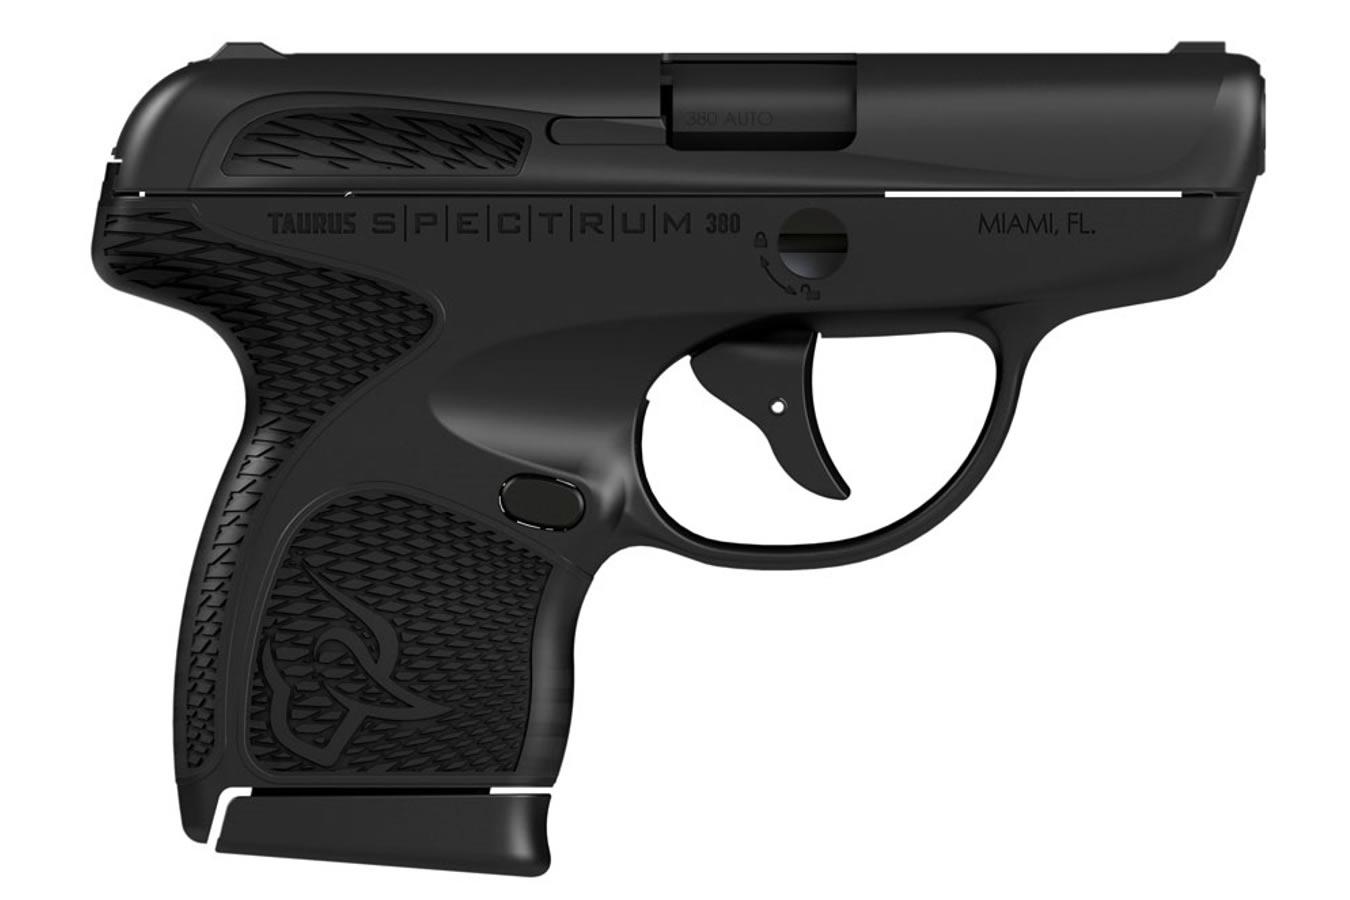 Sportsman's Best Sellers: Best Concealed Carry Handguns